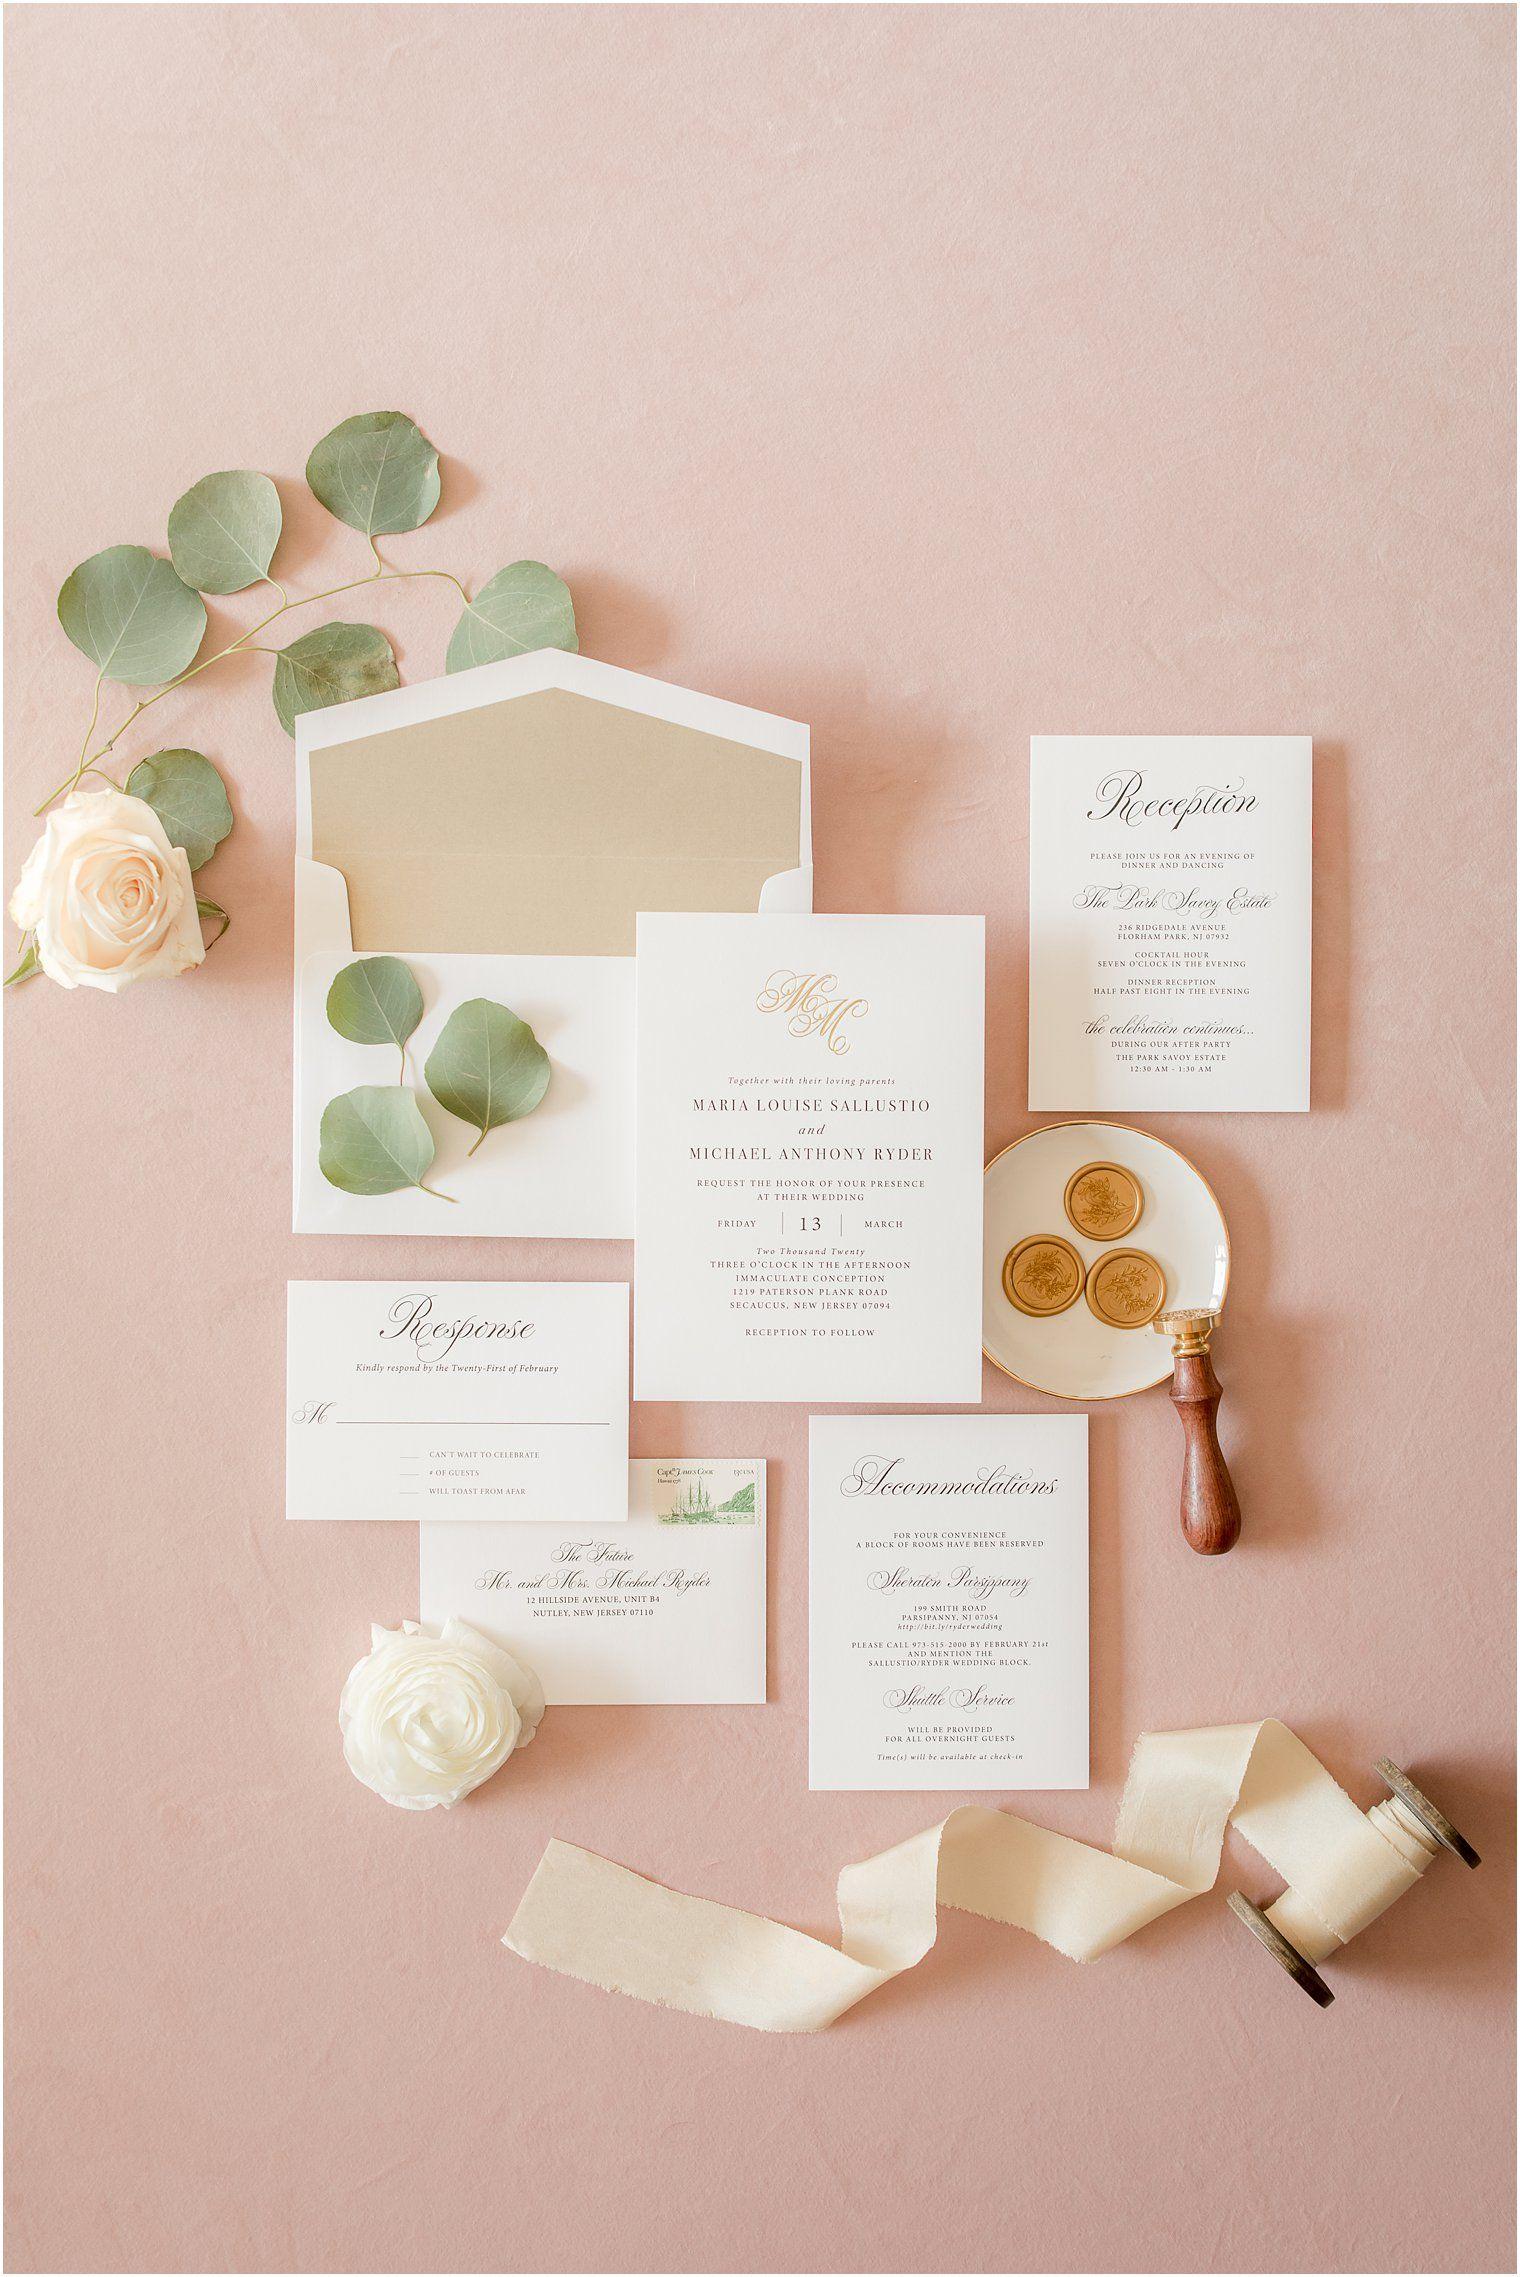 5 Tips For A Beautiful Wedding Invitation Flat Lay Nj Wedding Photographer Idalia Photography In 2020 Wedding Invitations Gold Wedding Invitations Beautiful Wedding Invitations